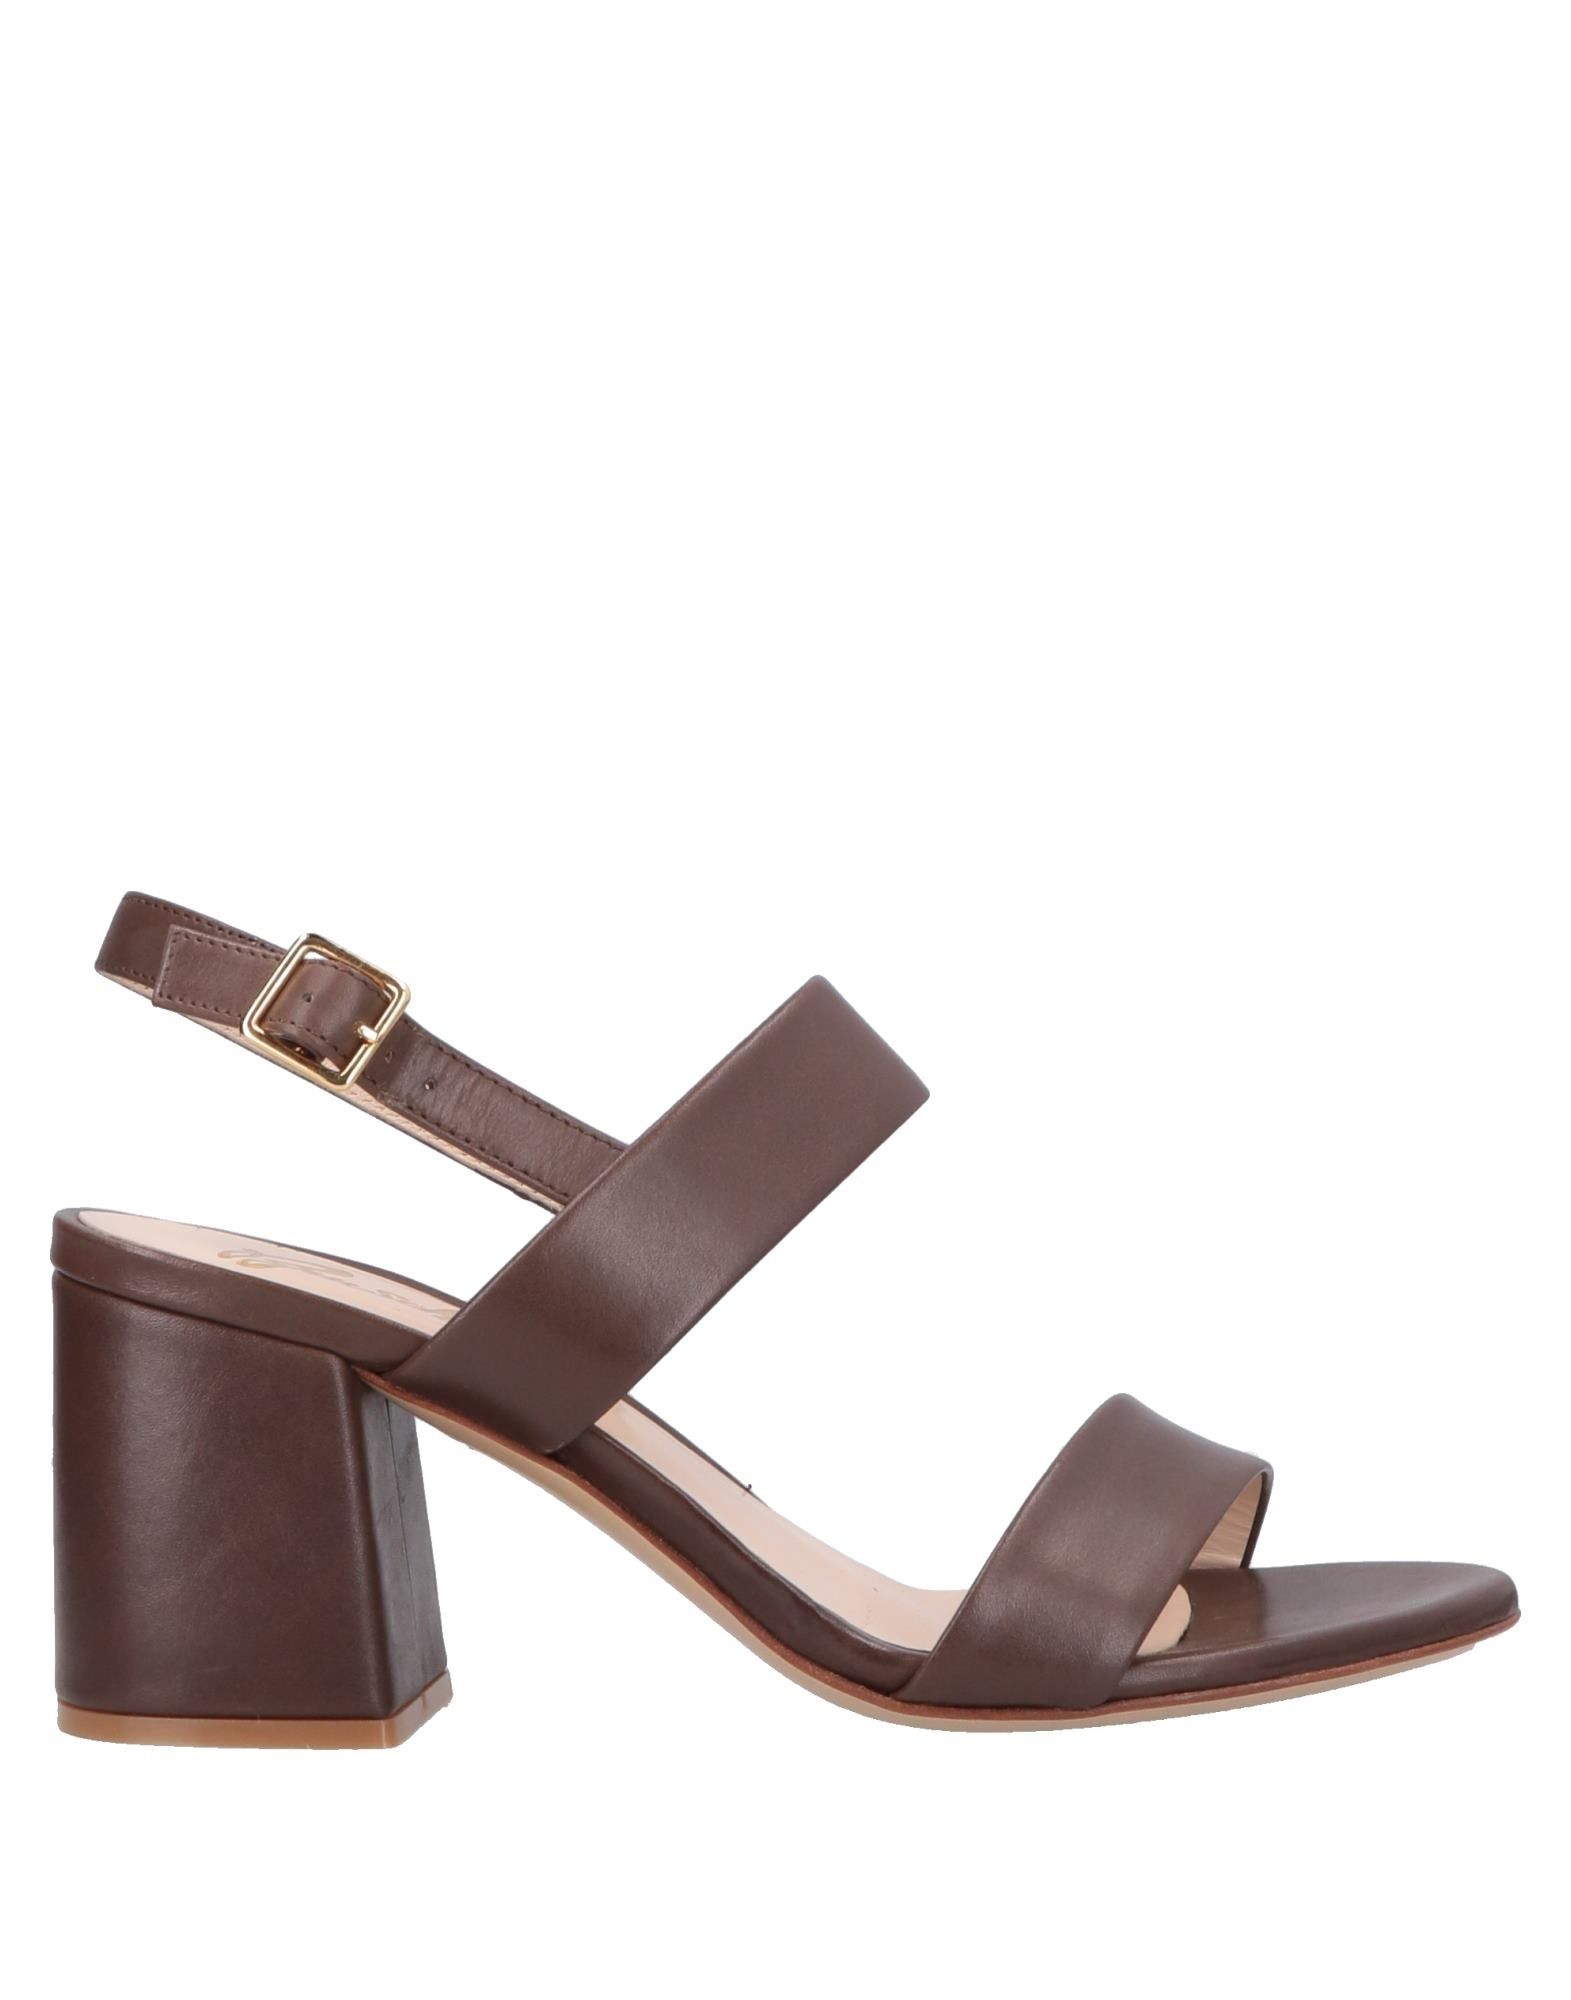 Bruschi Sandals Sandals - Women Bruschi Sandals Bruschi online on  United Kingdom - 11459308GA 680e0a